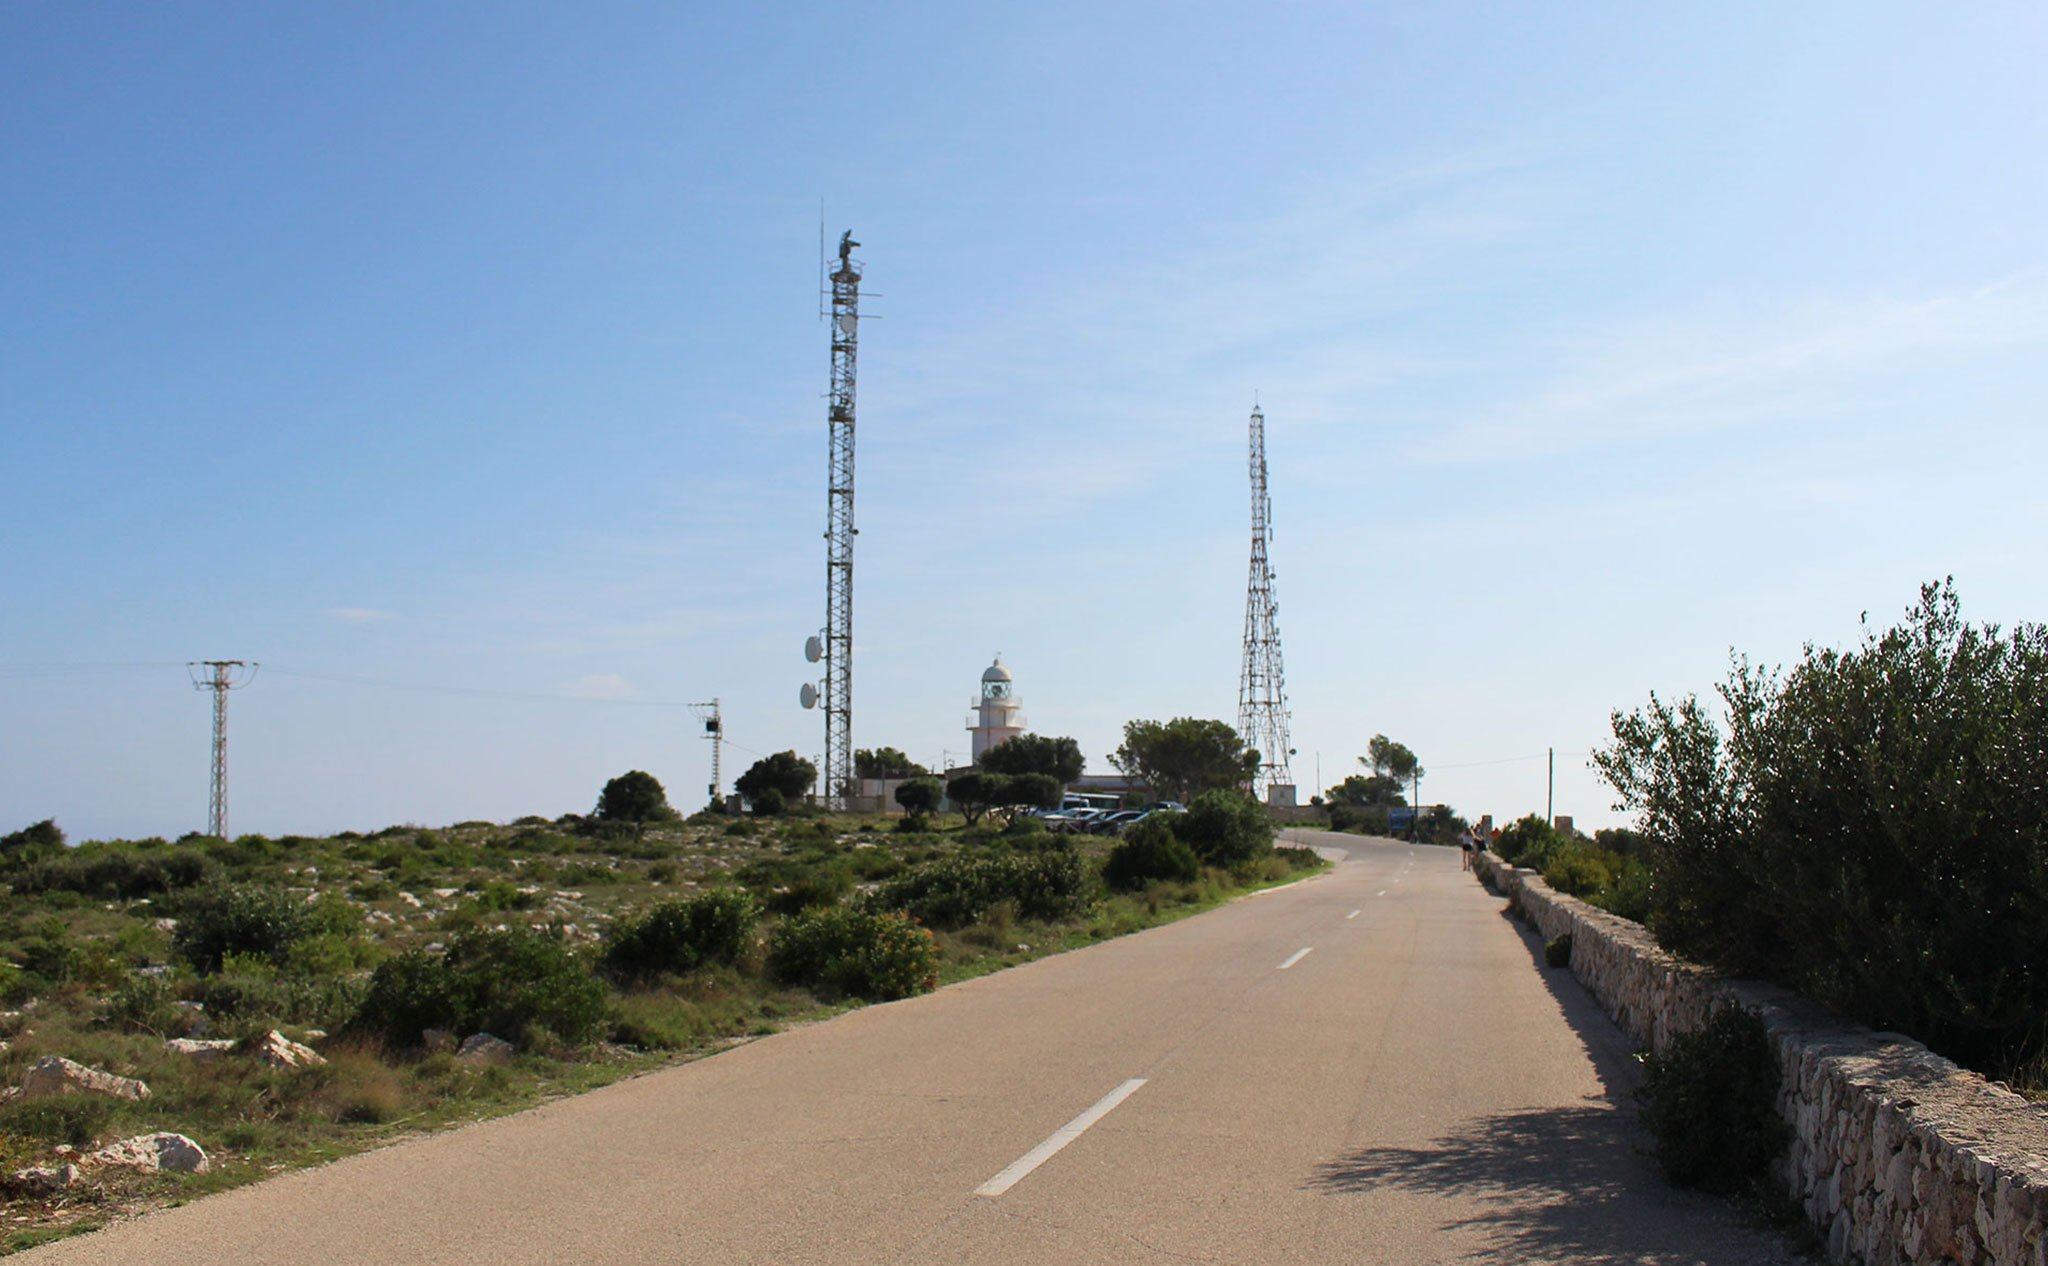 Carretera de llegada al Cap de Sant Antoni de Xàbia, con el faro al fondo